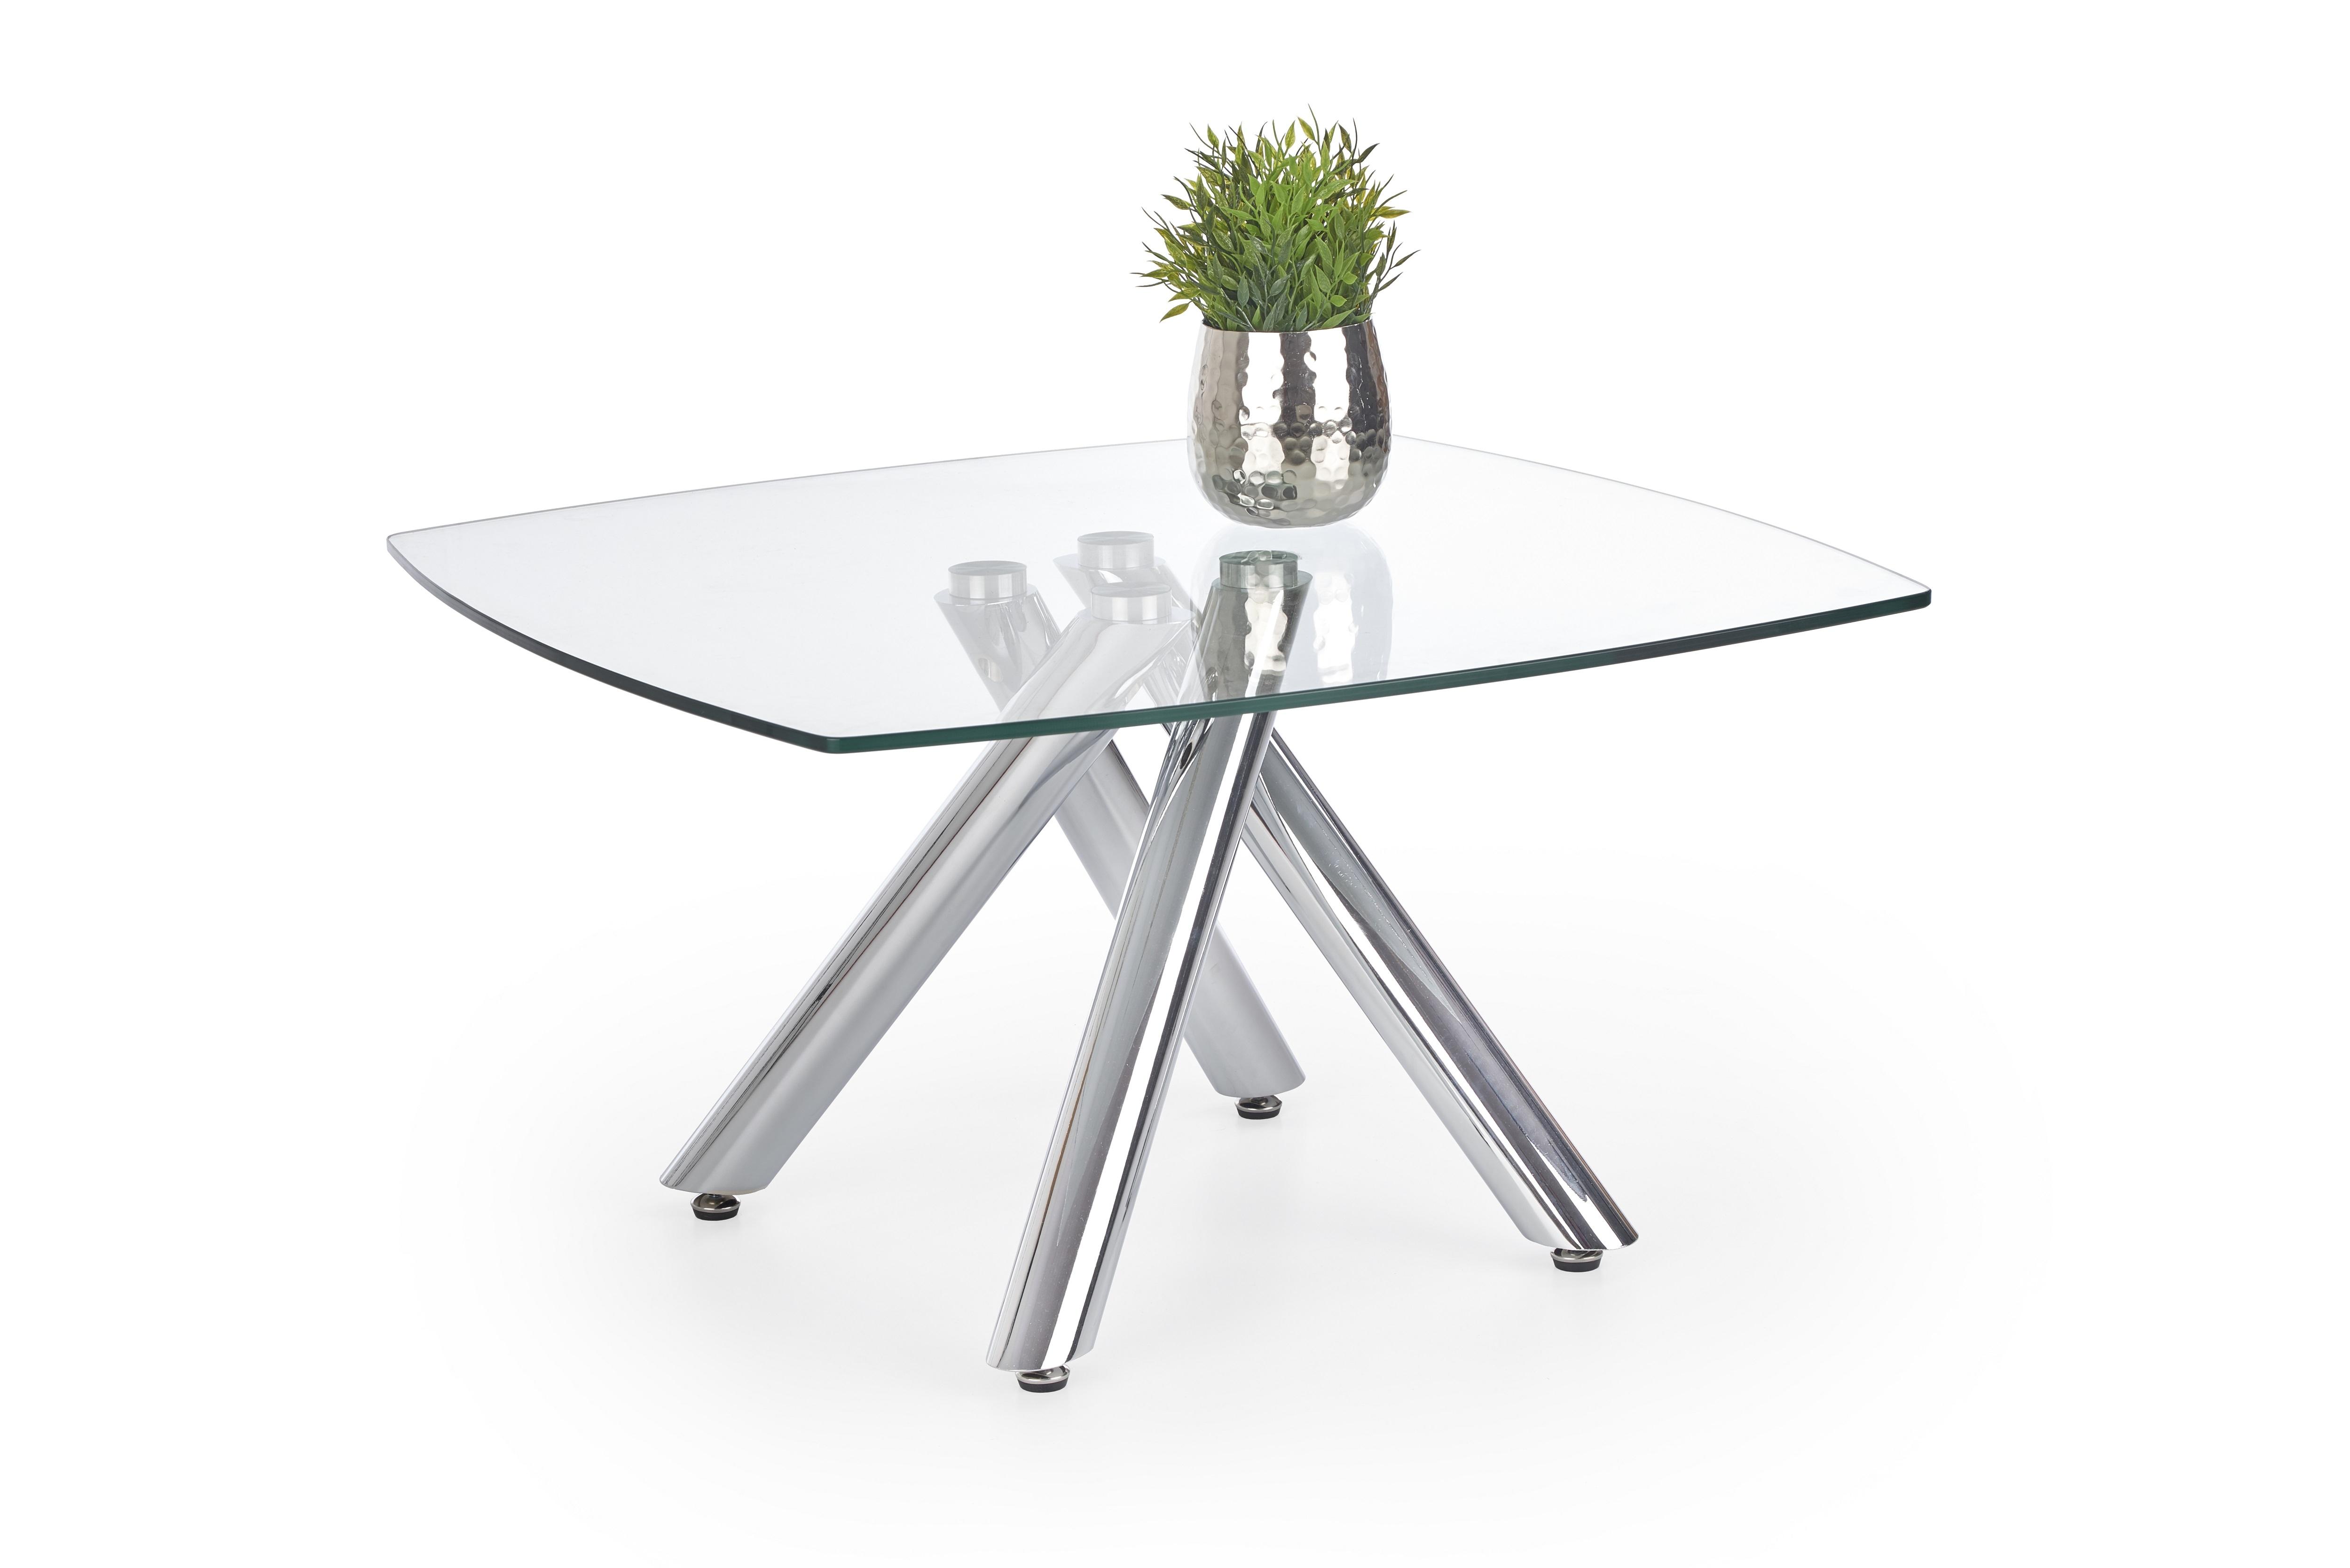 Masa de cafea din sticla si metal Almera, L80xl80xh45 cm imagine